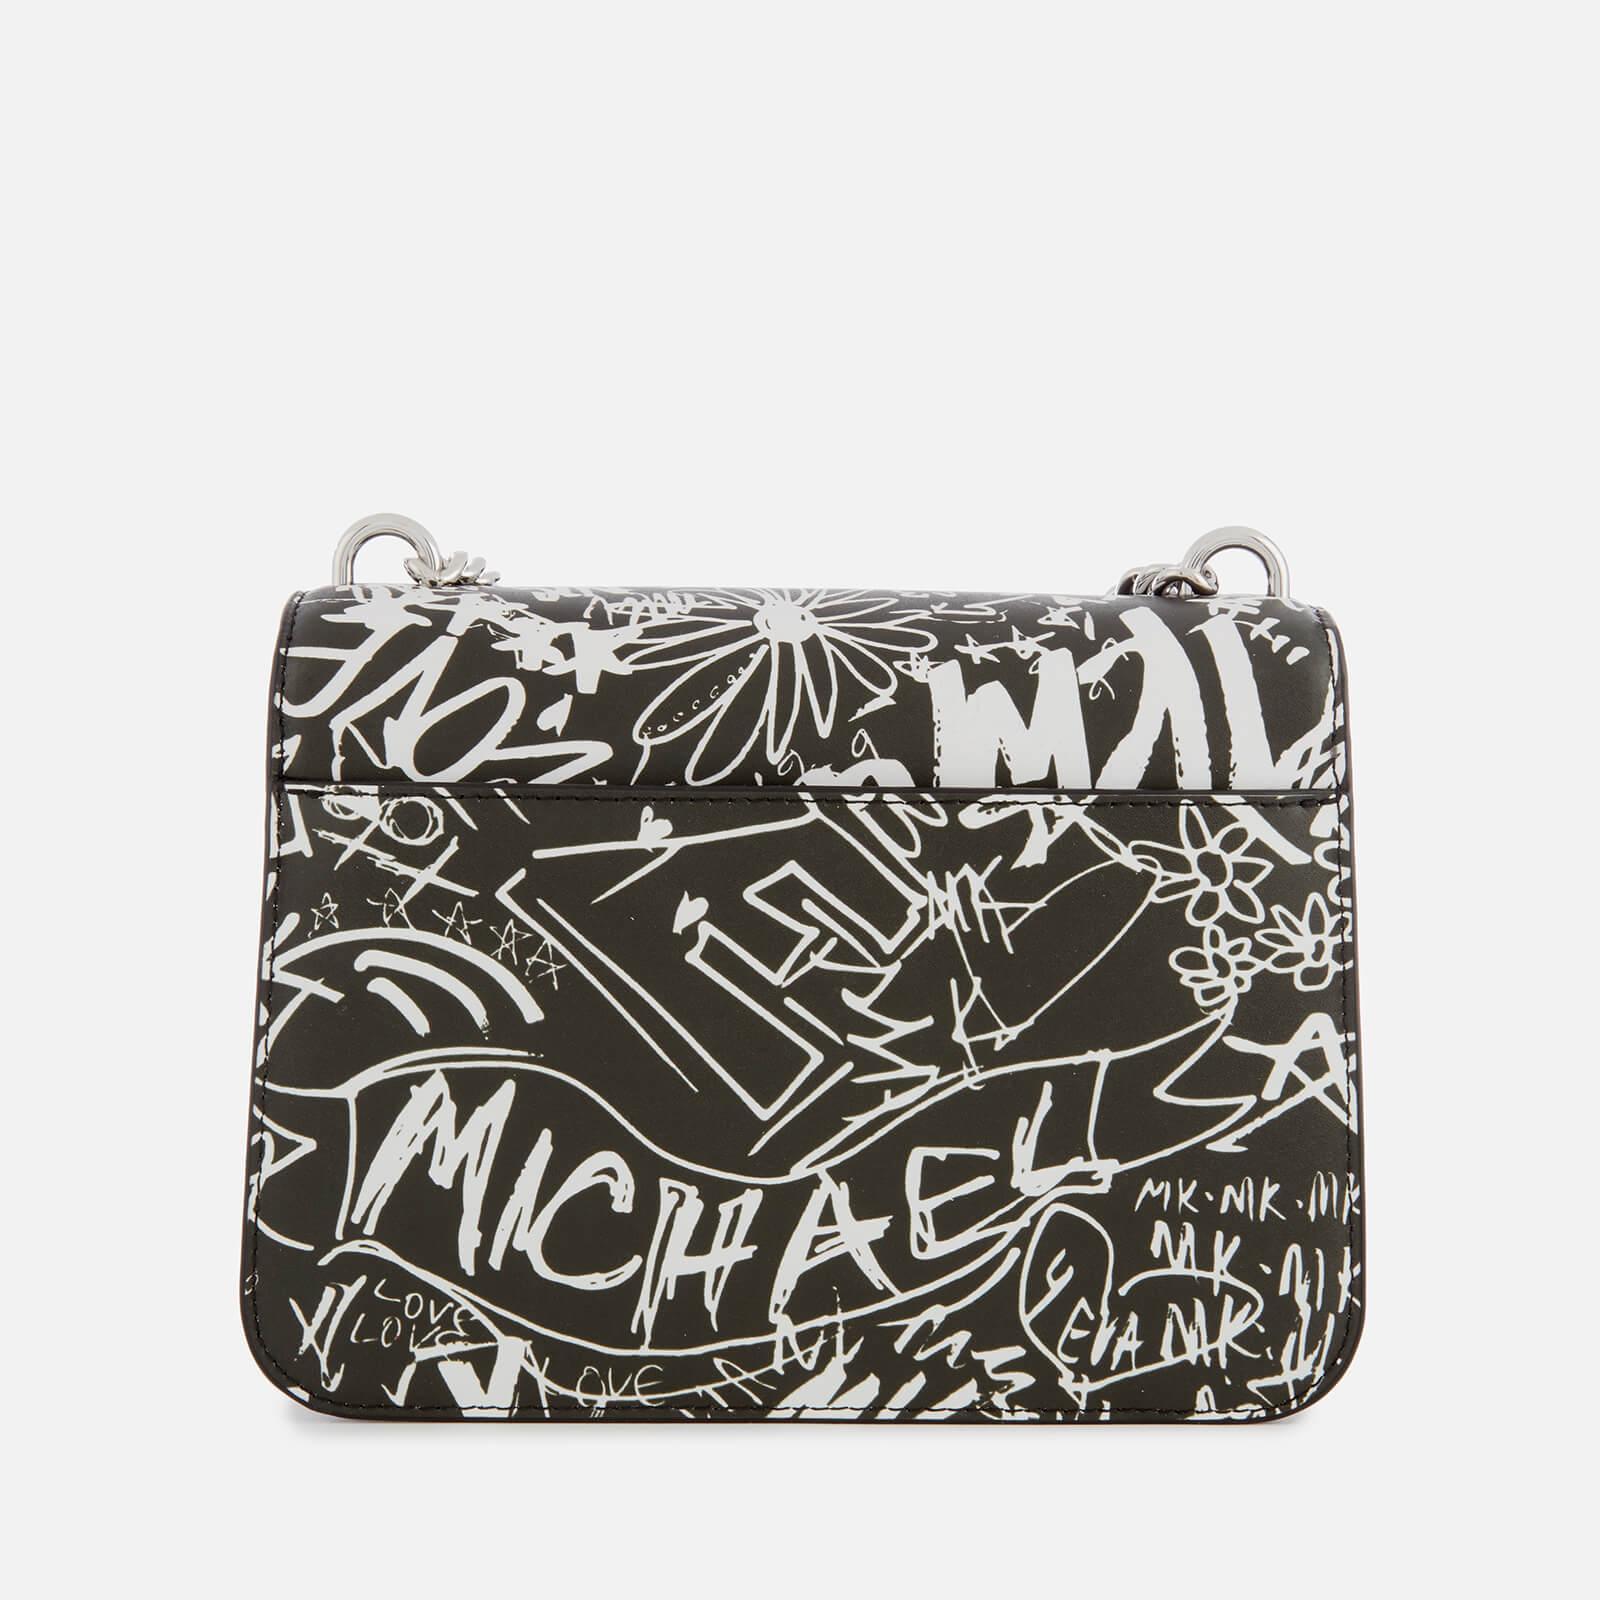 c18c8e8531dc MICHAEL Michael Kors - Multicolor Graffiti Calia Leather Cross Body Bag -  Lyst. View fullscreen